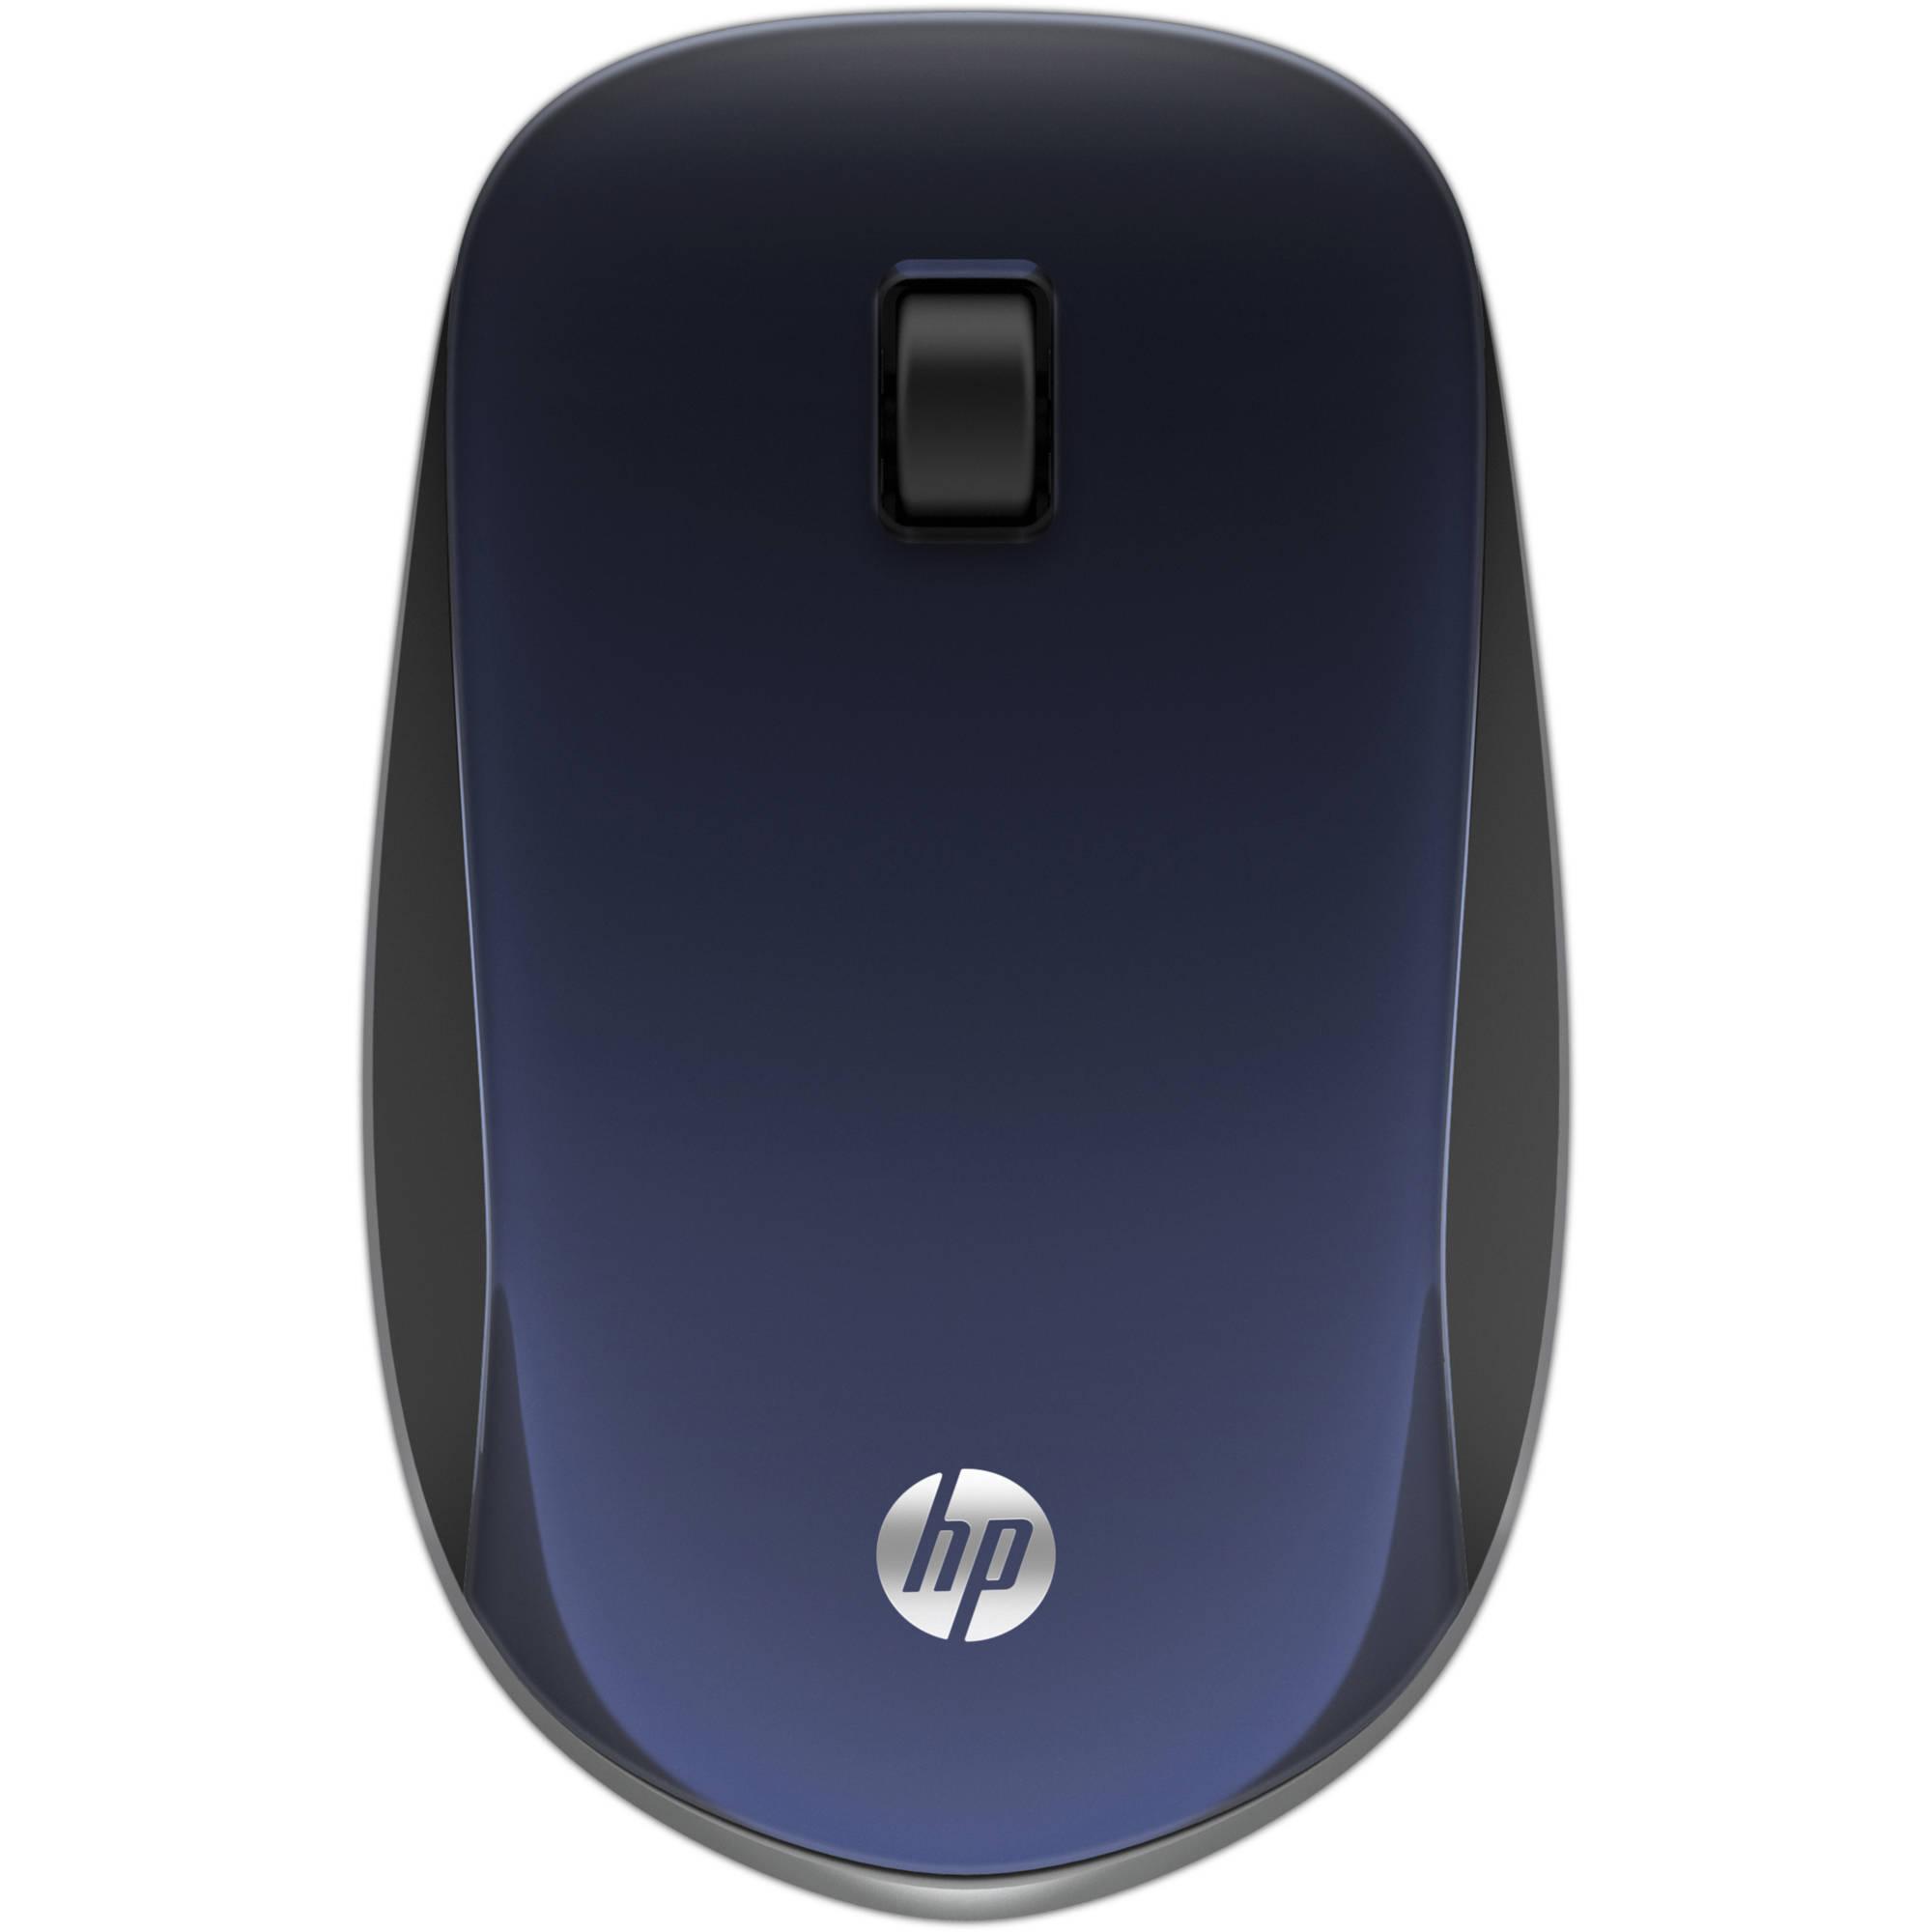 HP Z4000 Wireless Mouse